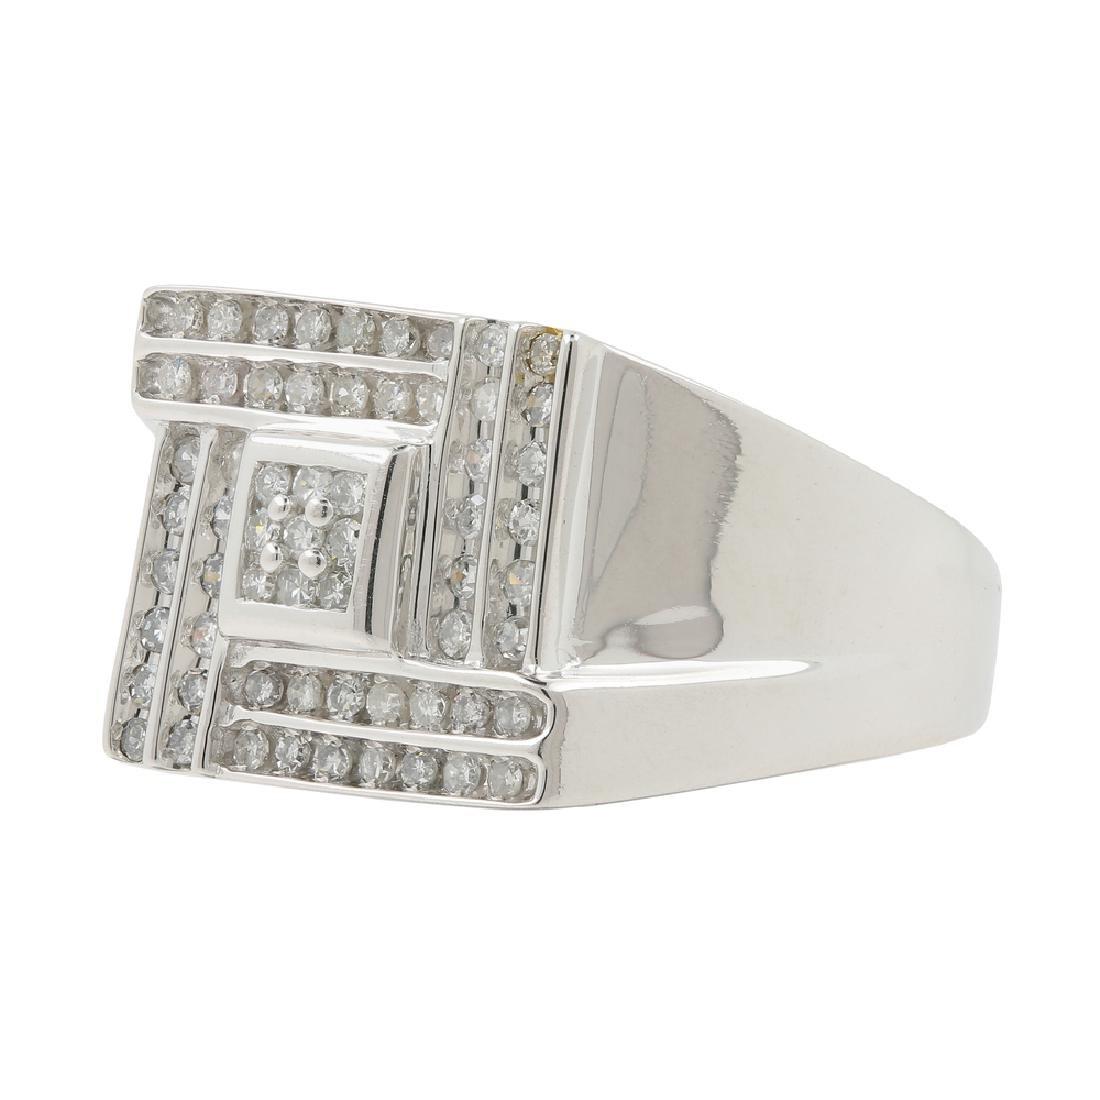 Men's Vintage Classic Estate 10K White Gold Diamond